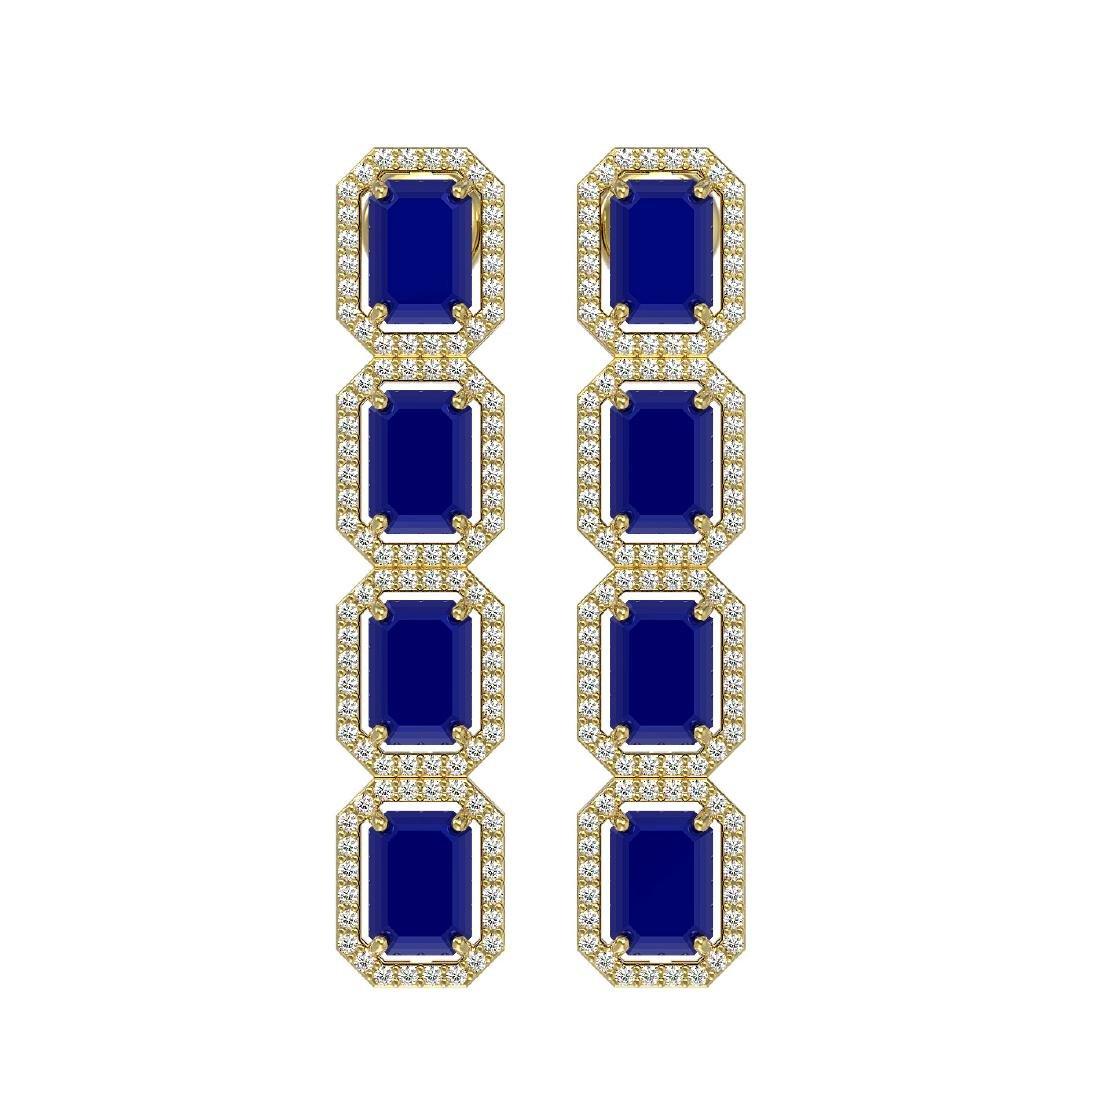 12.33 CTW Sapphire & Diamond Halo Earrings 10K Yellow